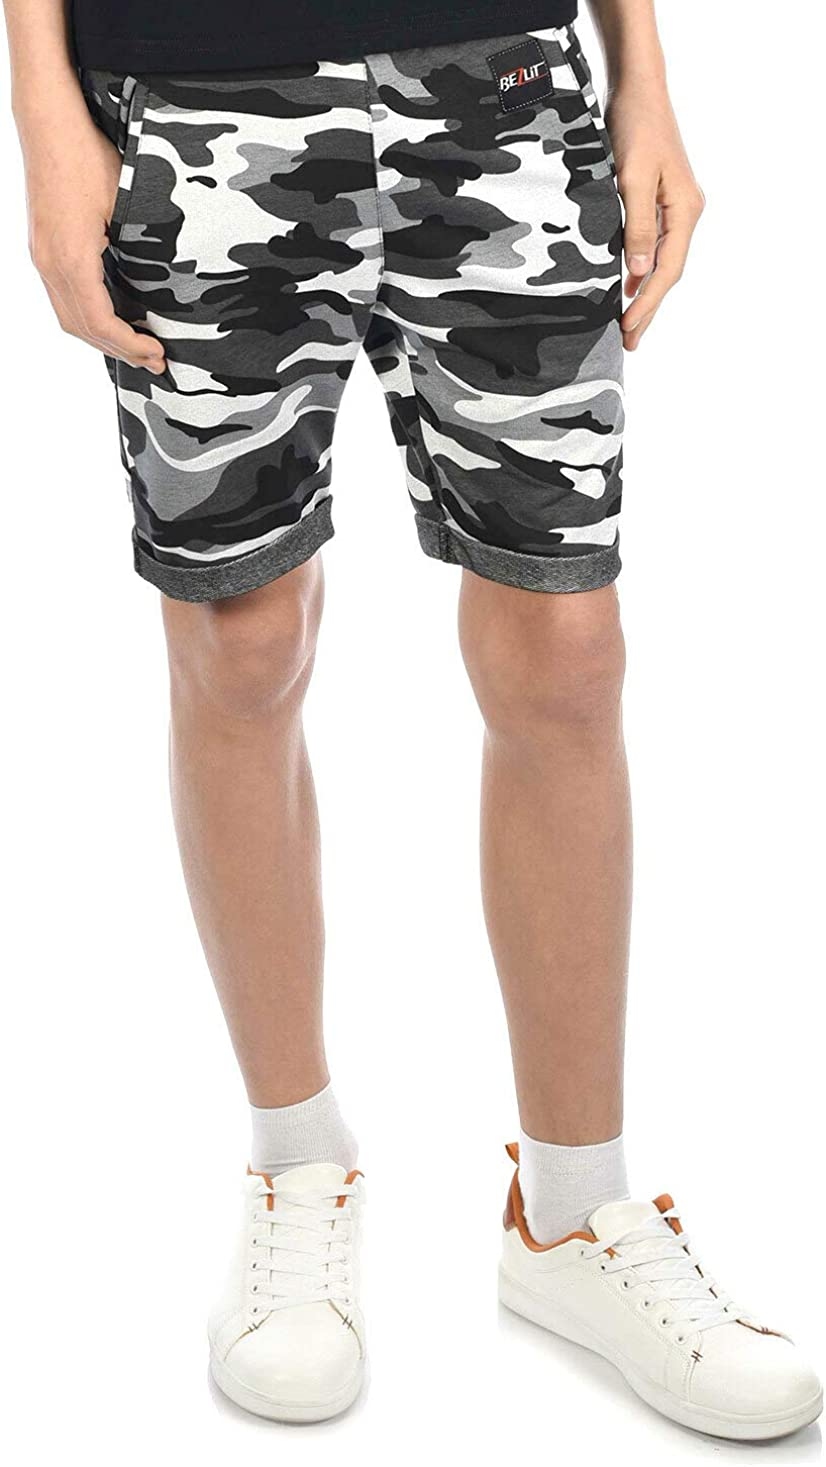 BEZLIT Kinder Cargo Shorts Kurze Hose Junge Jeans Capri Bermuda Shorts 30056